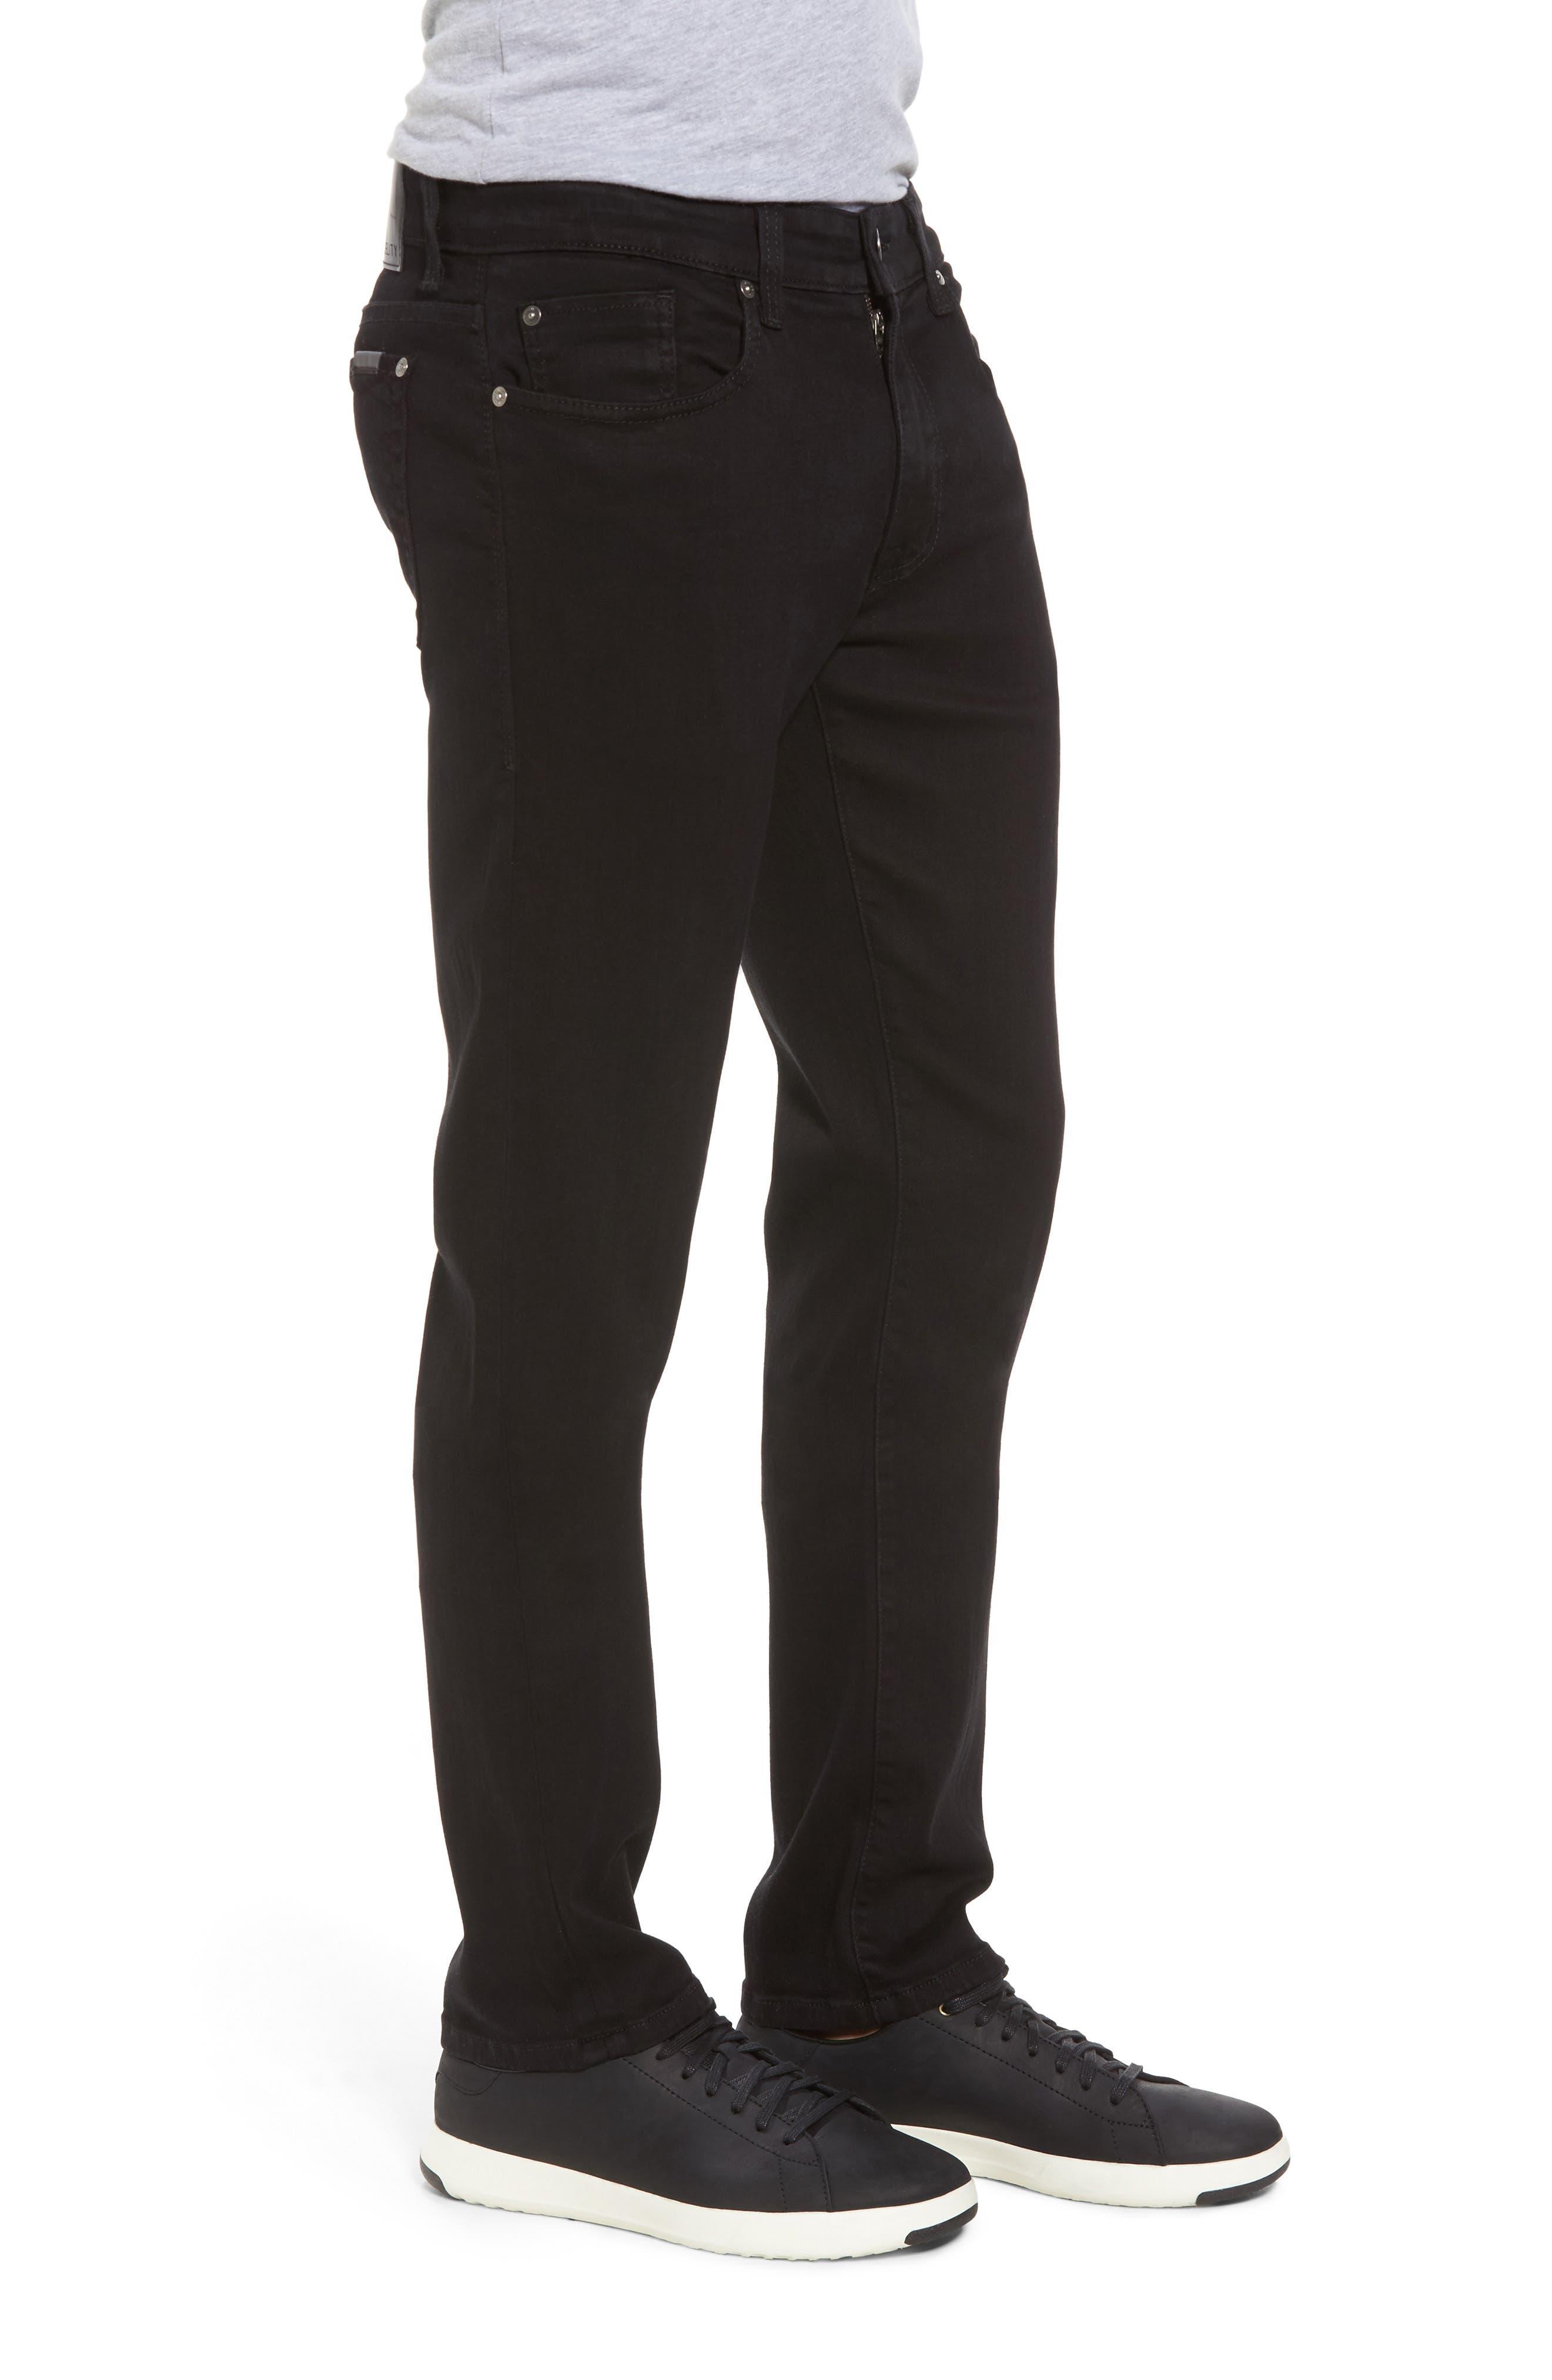 Torino Slim Fit Jeans,                             Alternate thumbnail 3, color,                             Everblack